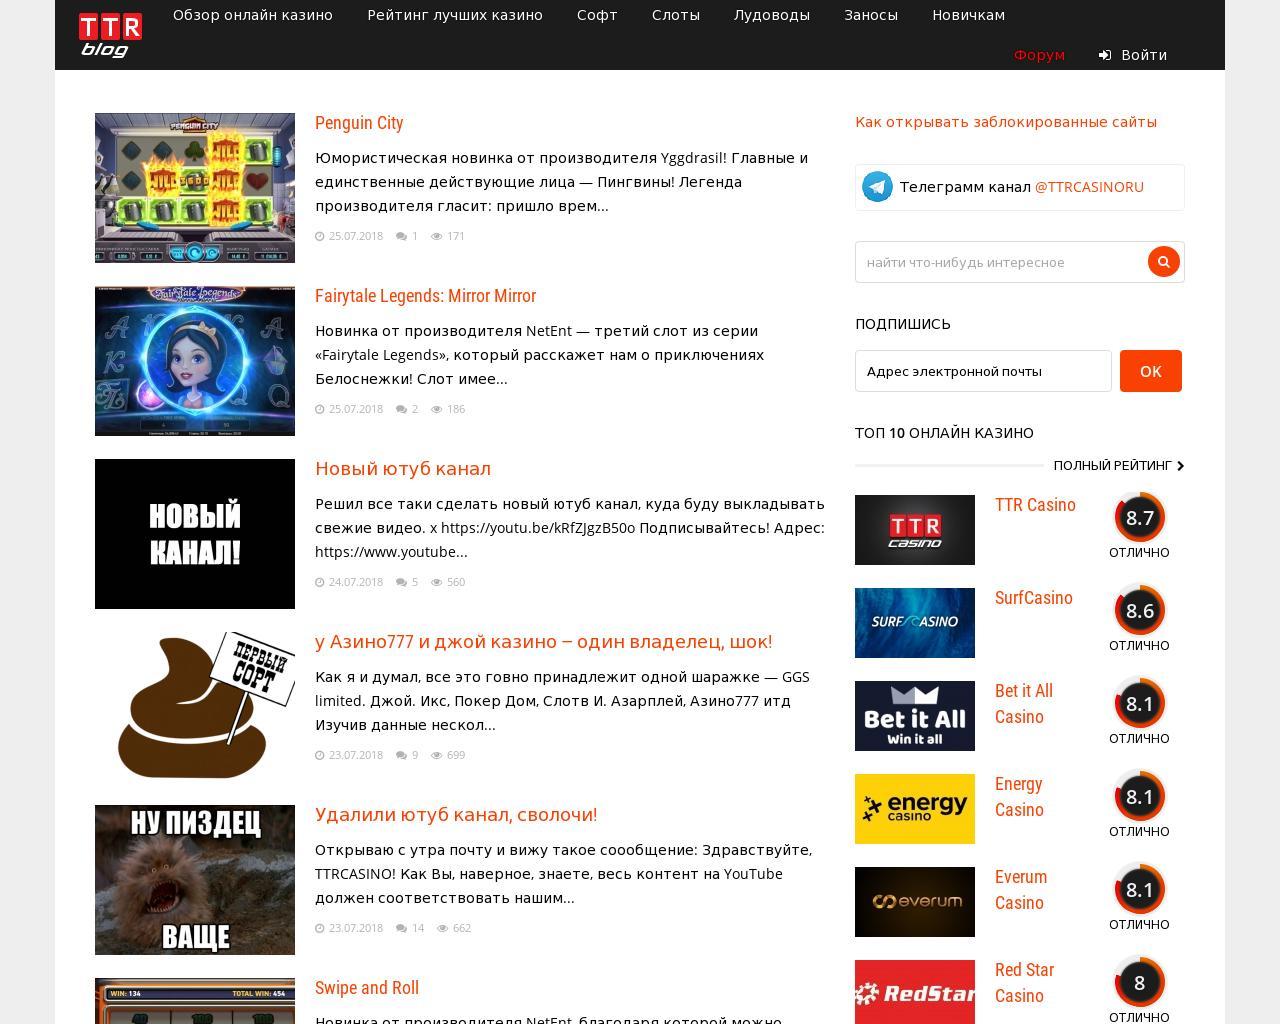 ттр блог рейтинг казино